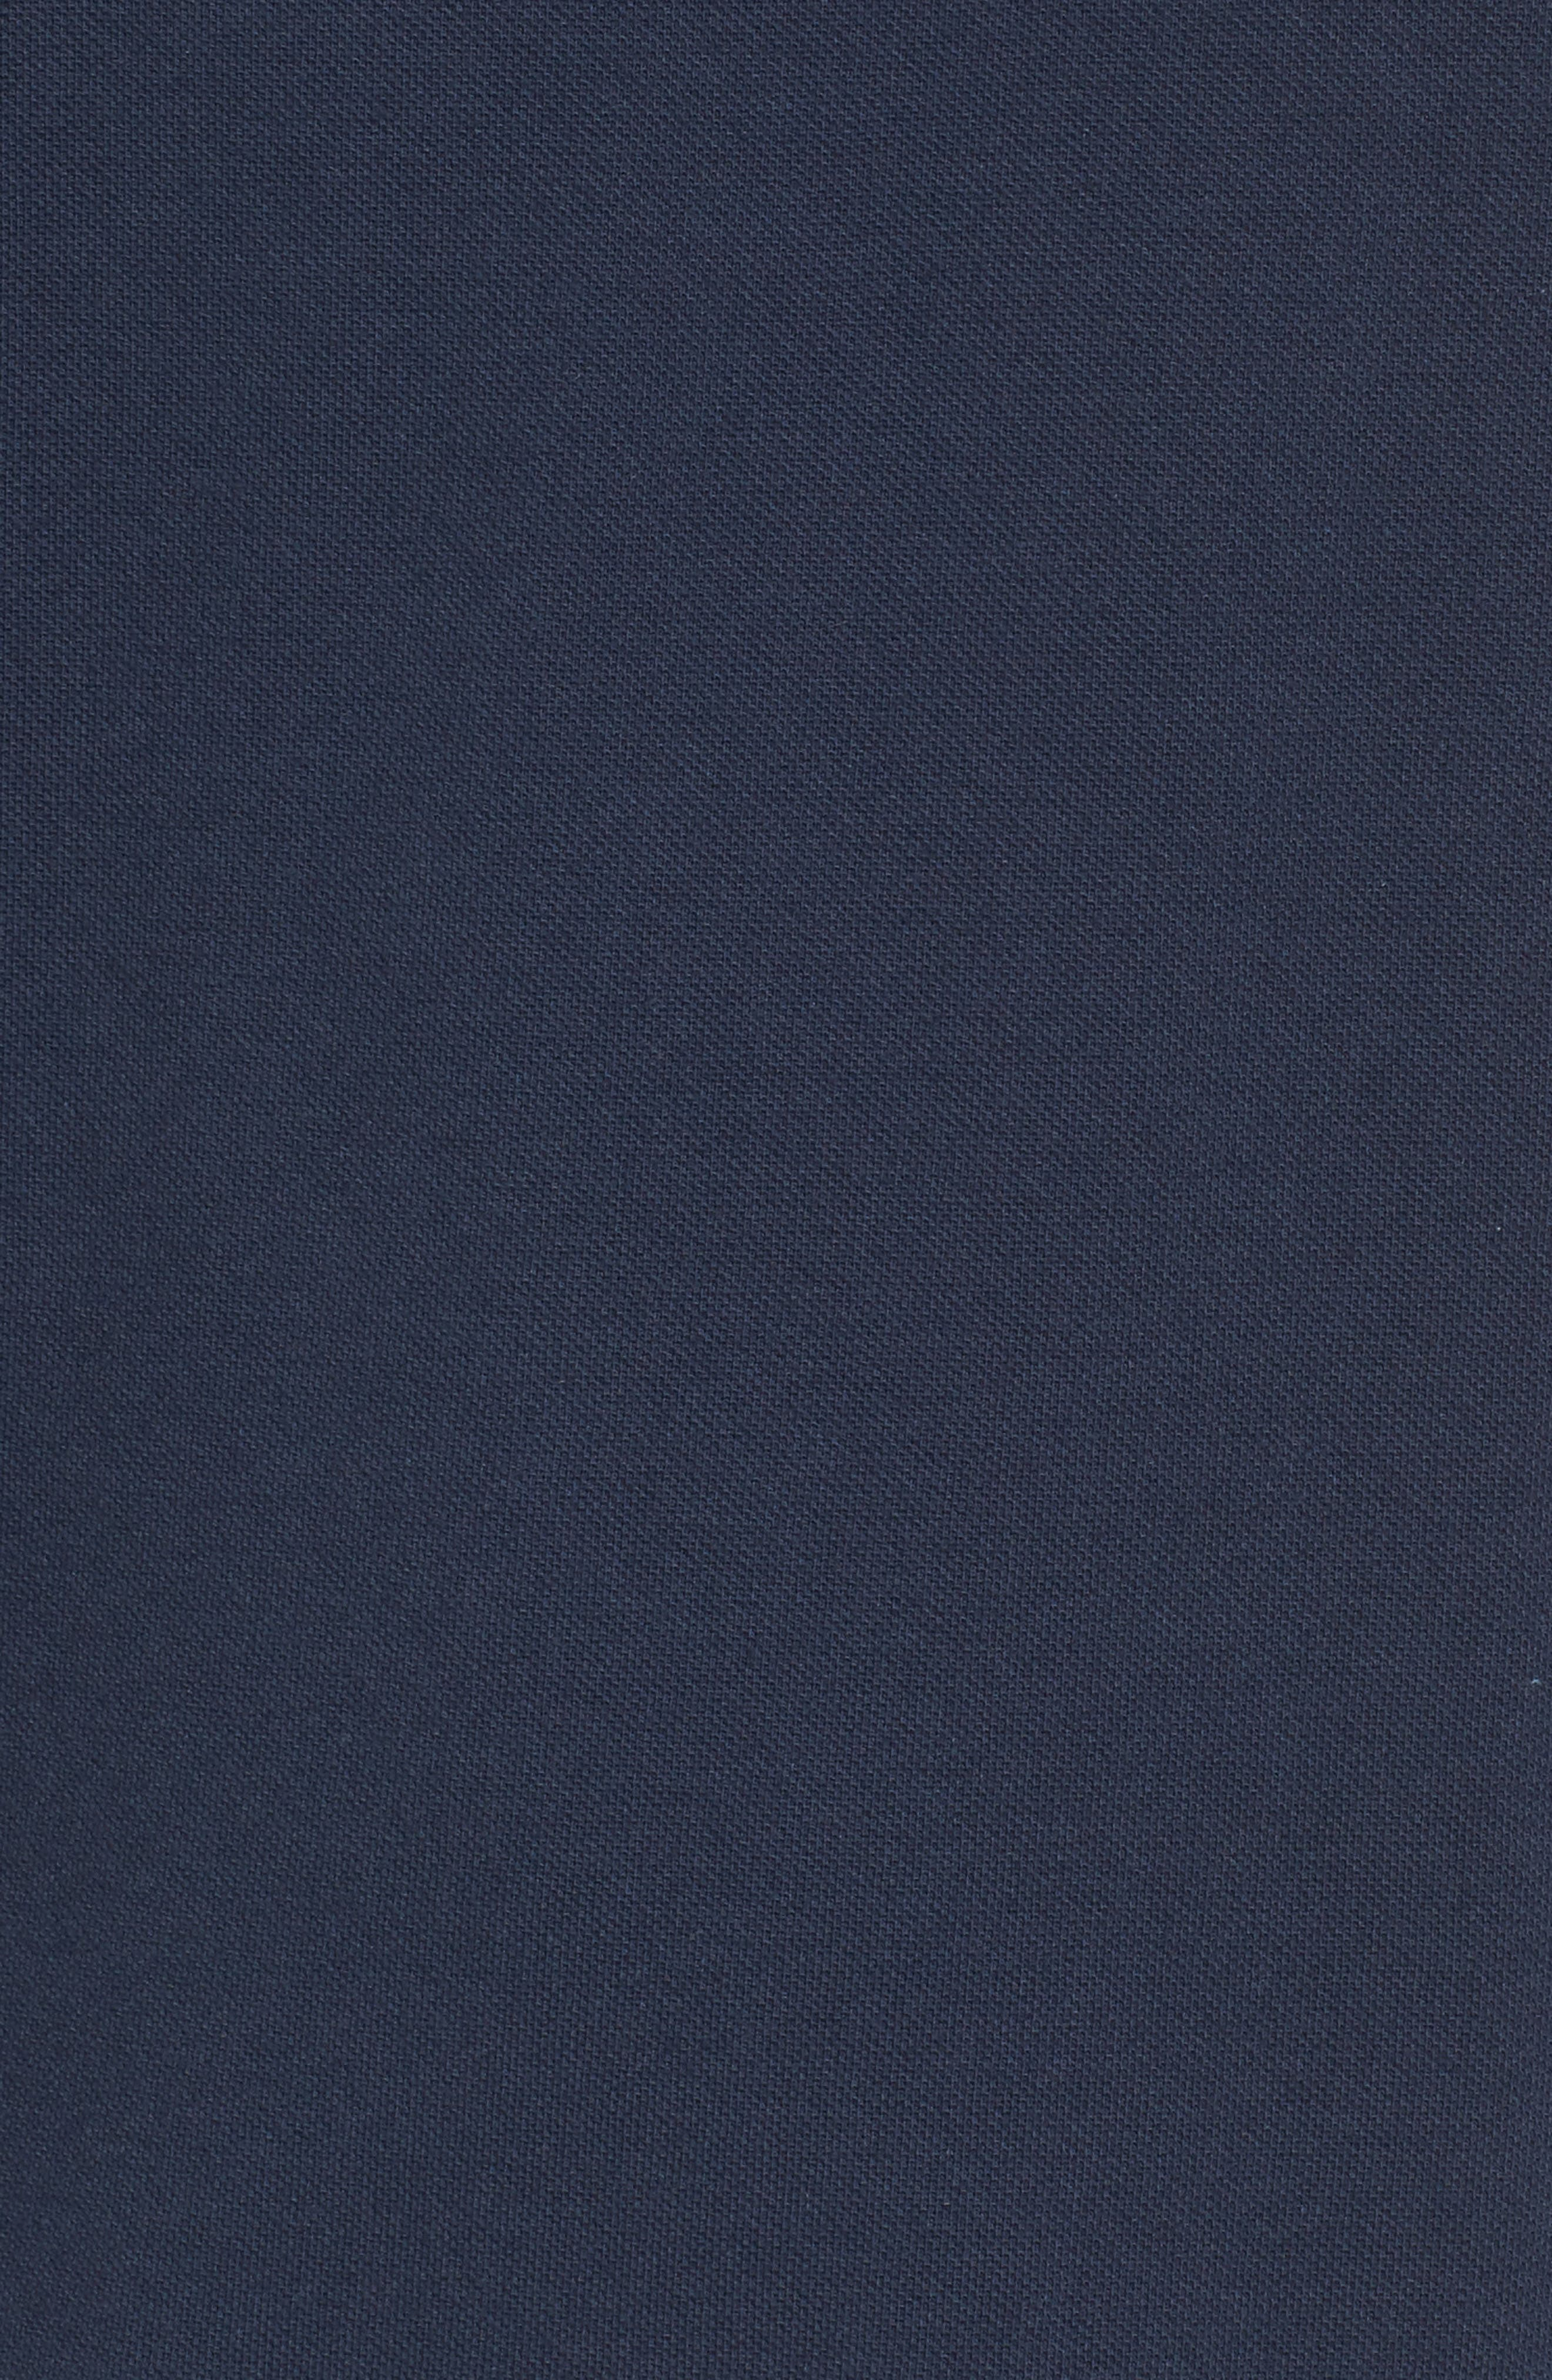 Salton Embroidered Piqué Tank,                             Alternate thumbnail 5, color,                             Dress Blues